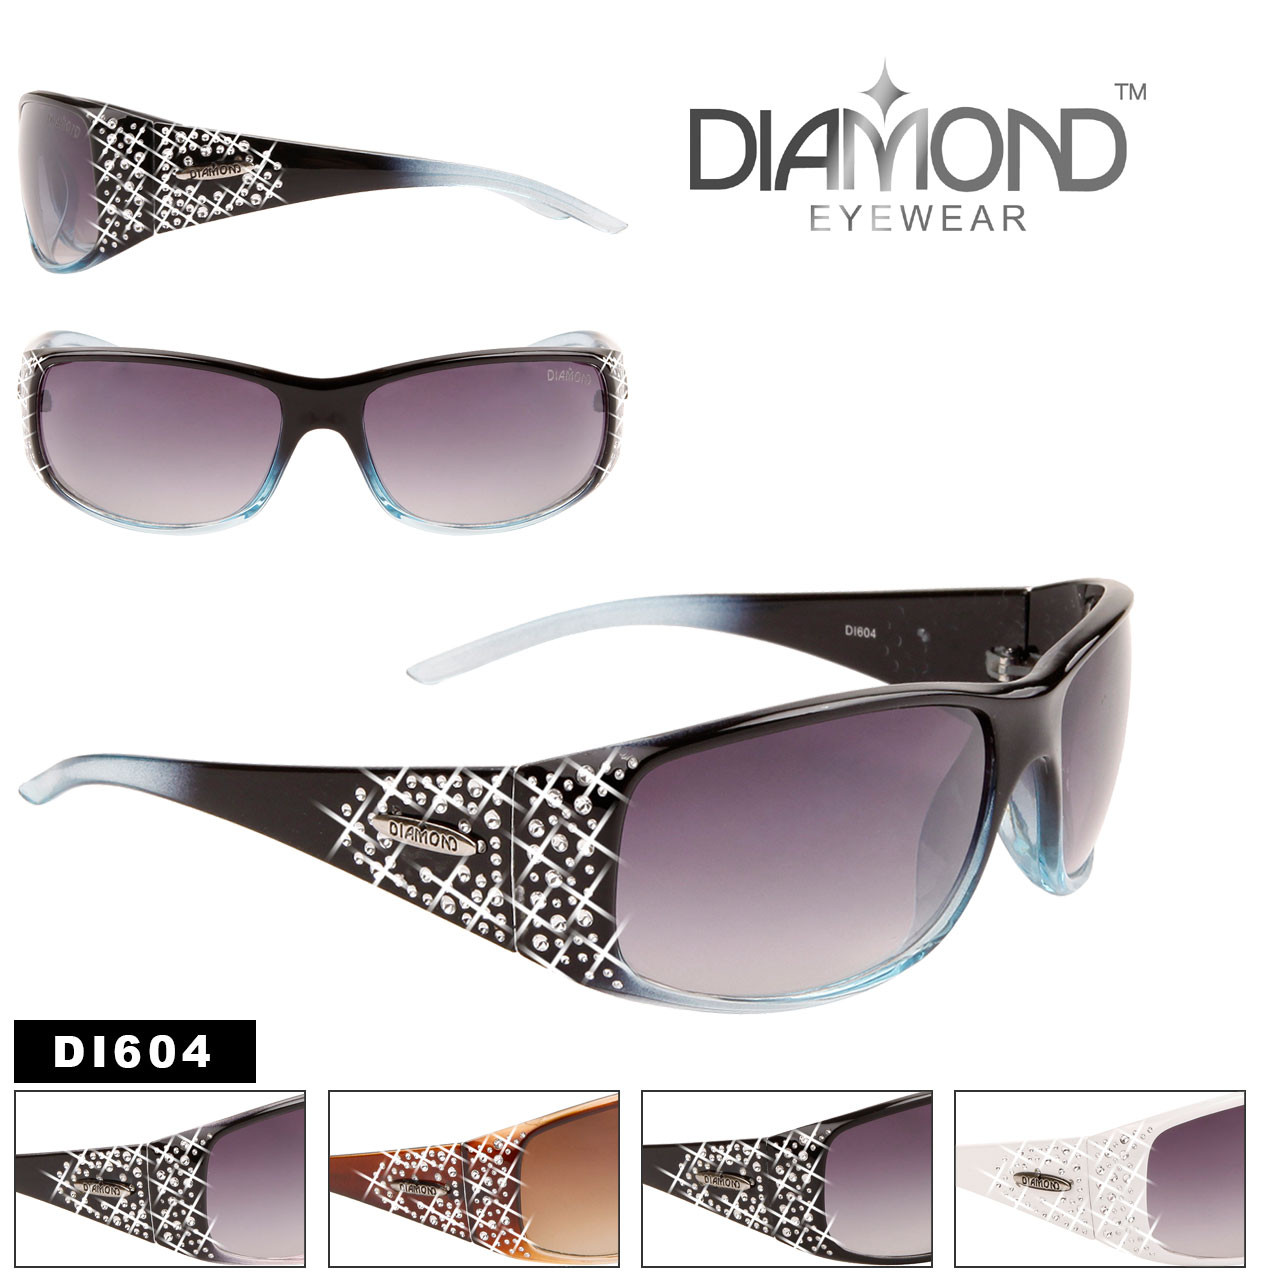 Diamond™ Eyewear Wholesale Designer Sunglasses - Style #DI604